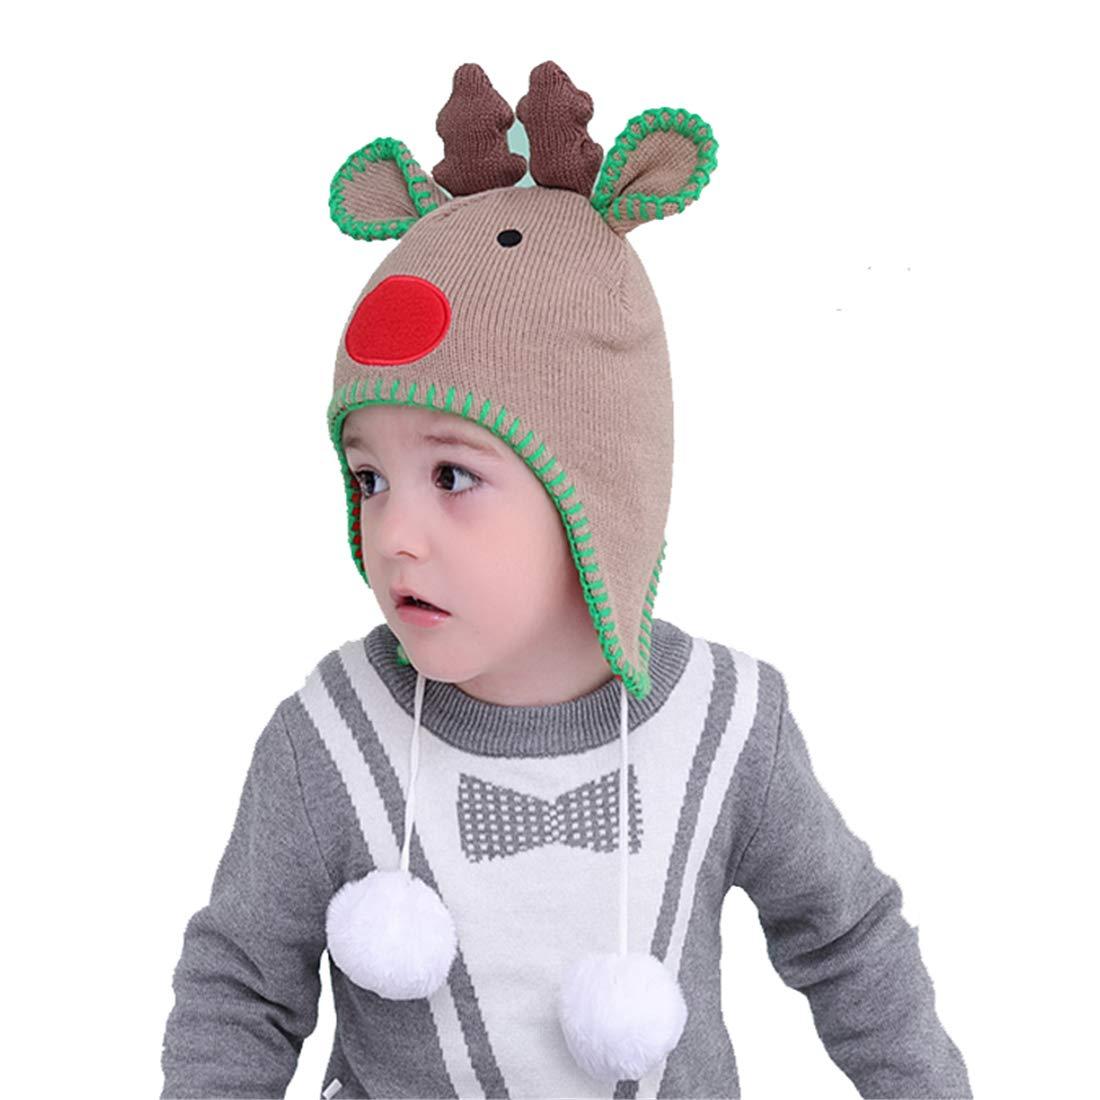 Bonvince Kids Winter Hat Beanies Caps Cute Thick Earflap Hat